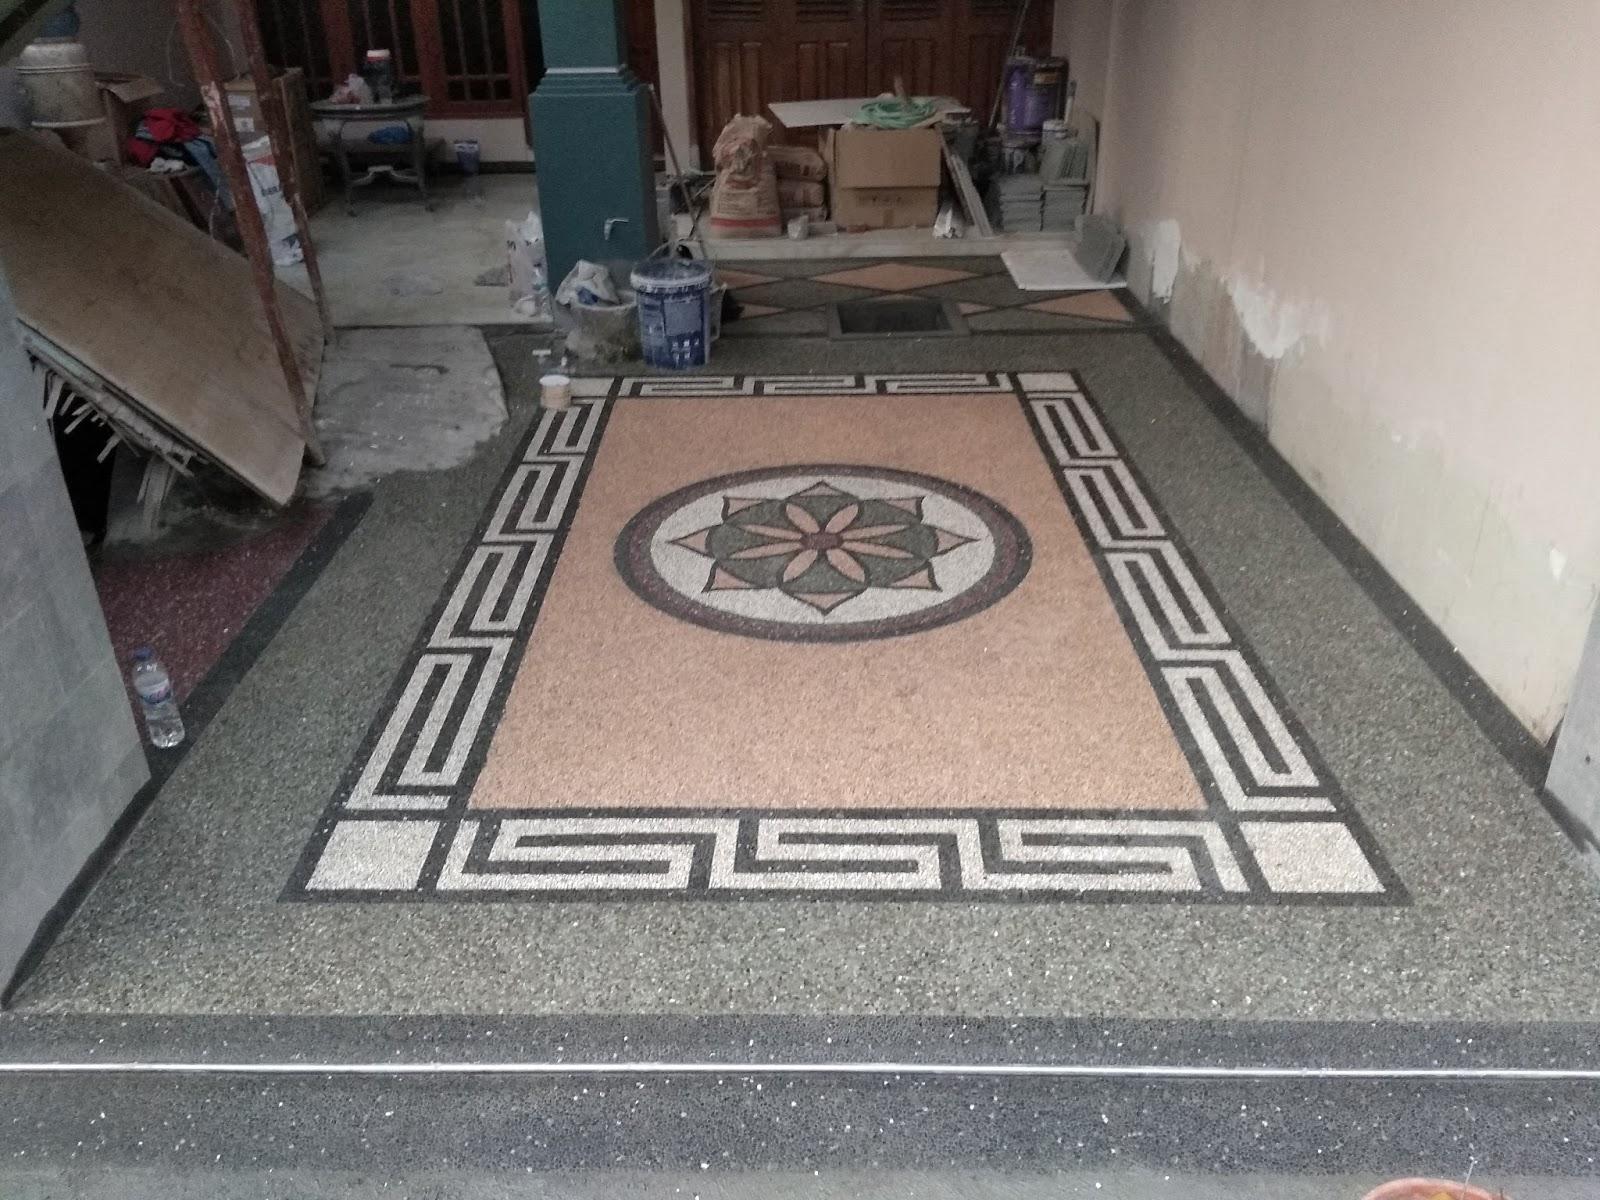 Jasa Tukang Batu Carport Sikat Di Surabaya Barat Timur Utara Bagus Lantai Pemasangan Alam Dan Dinding Teras Banyak Digunakan Untuk Membuat Seperti